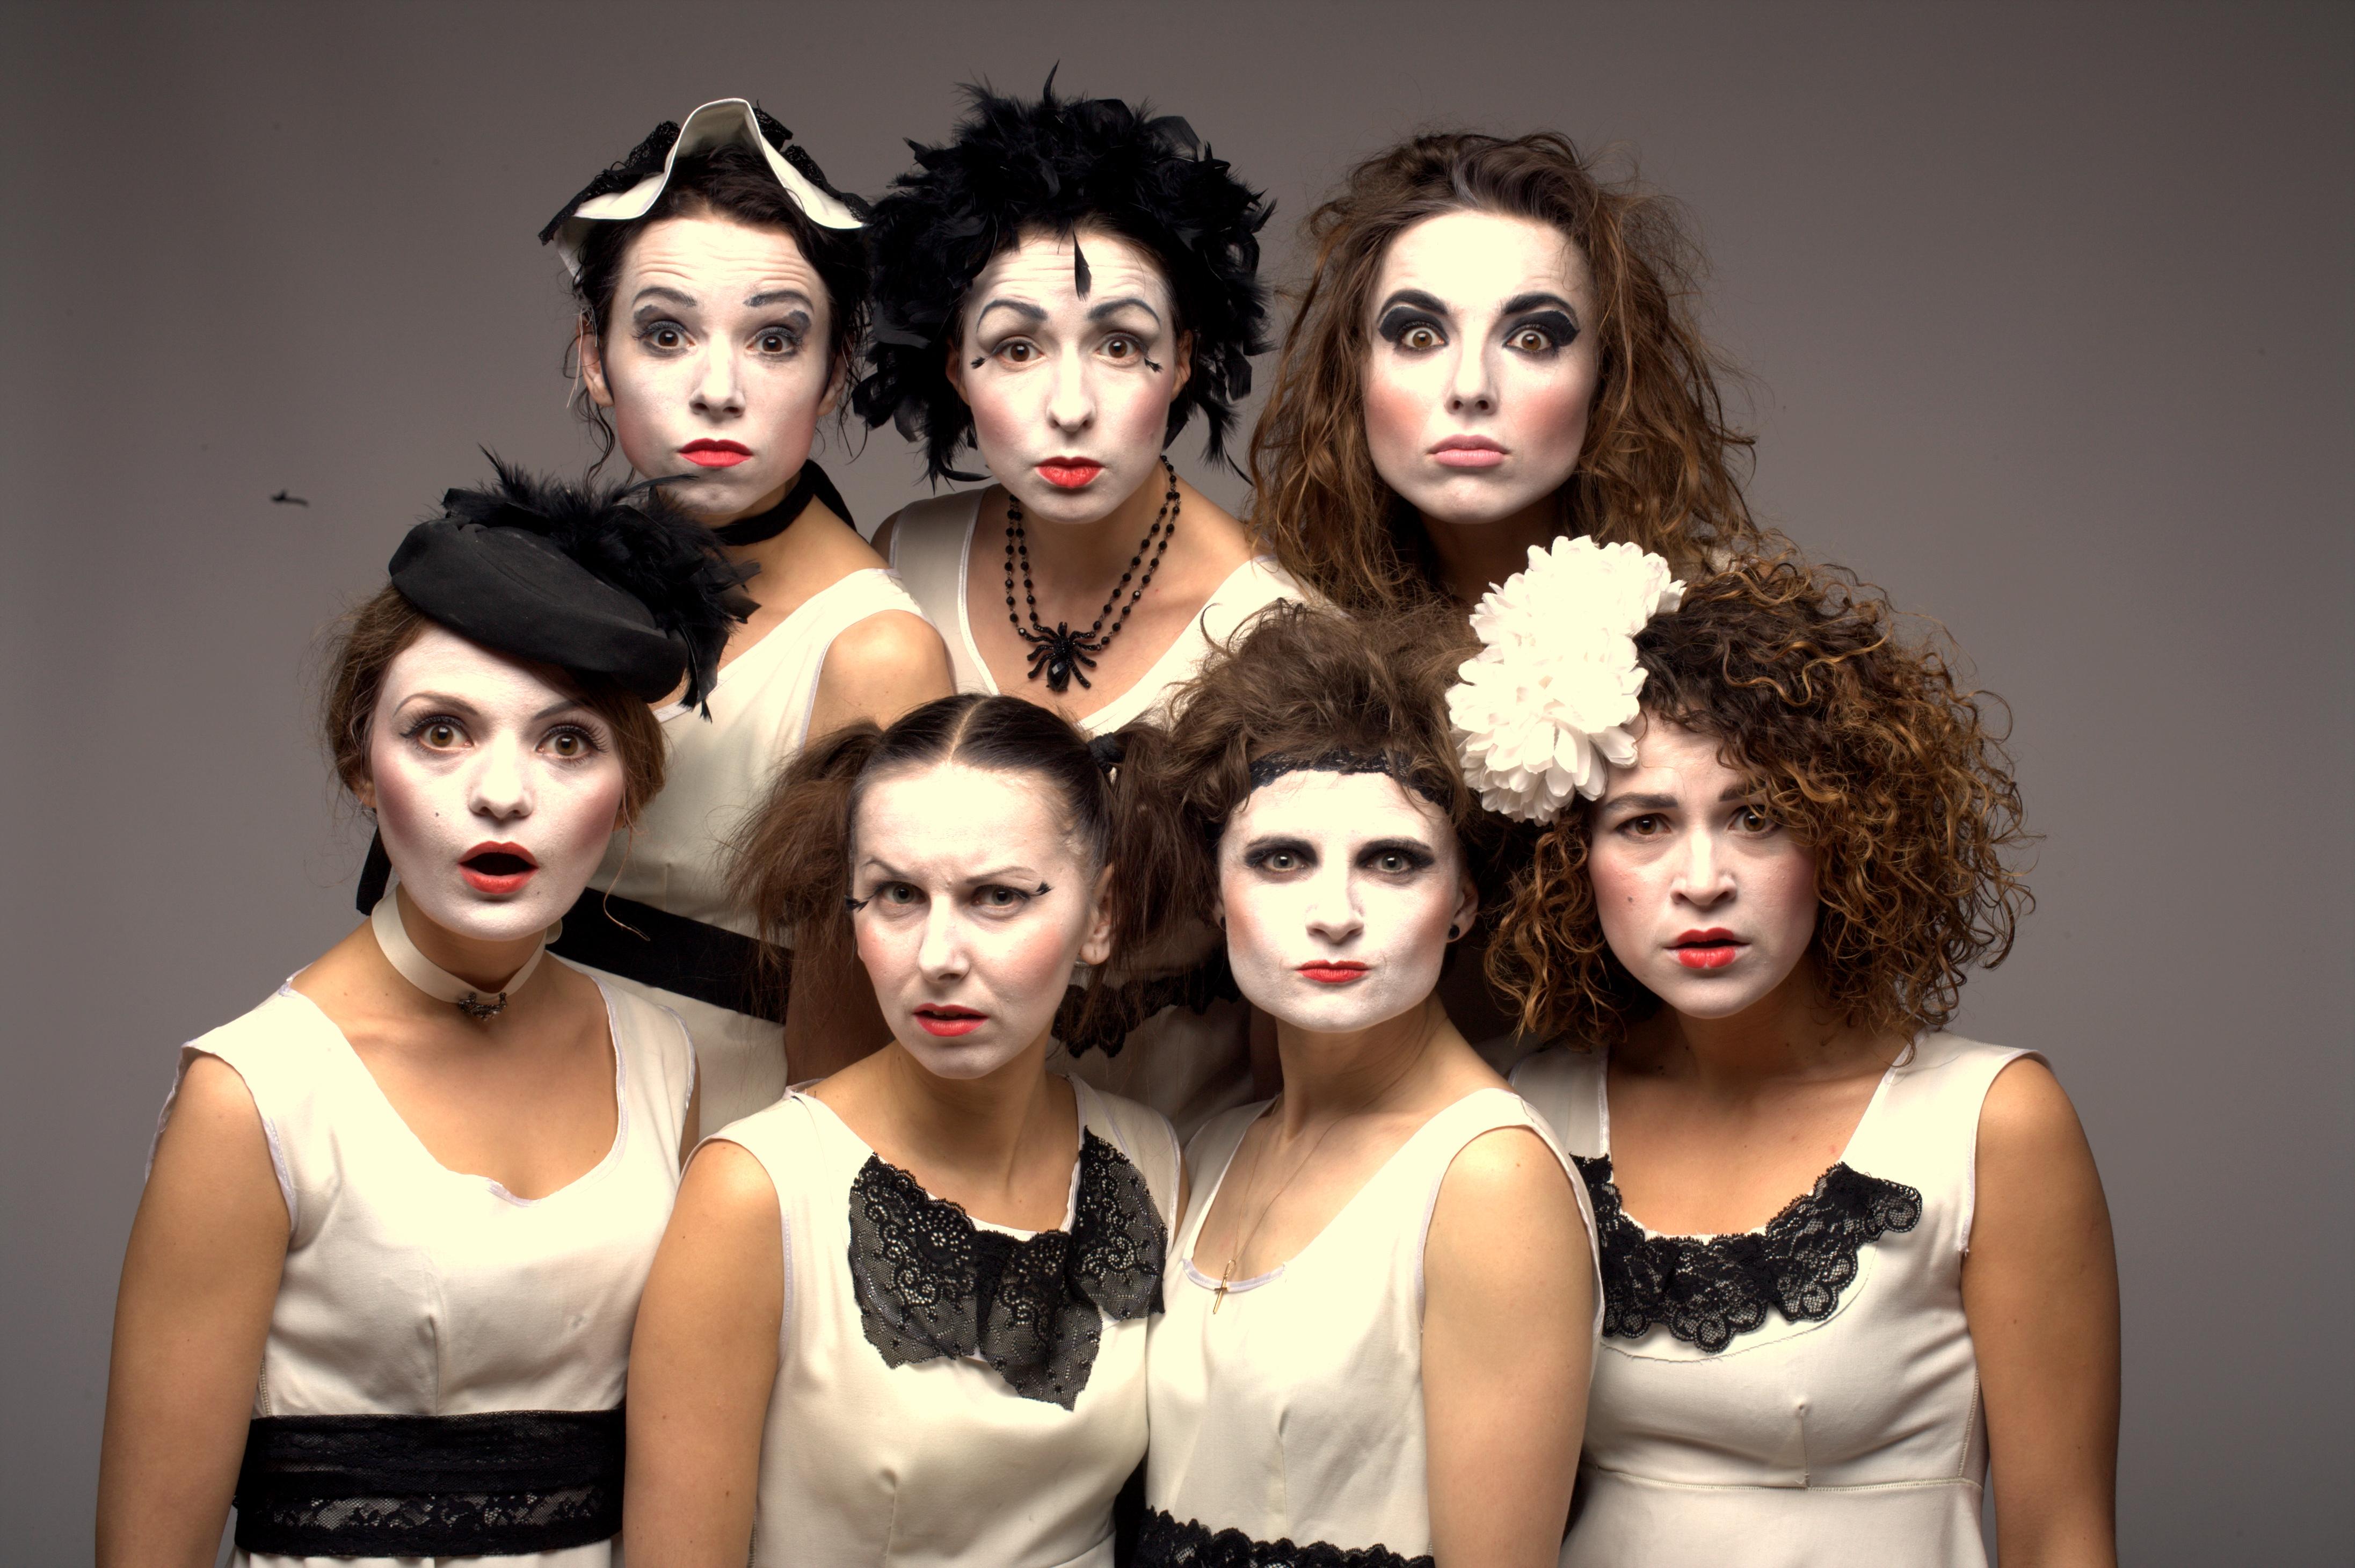 Freak Cabaret